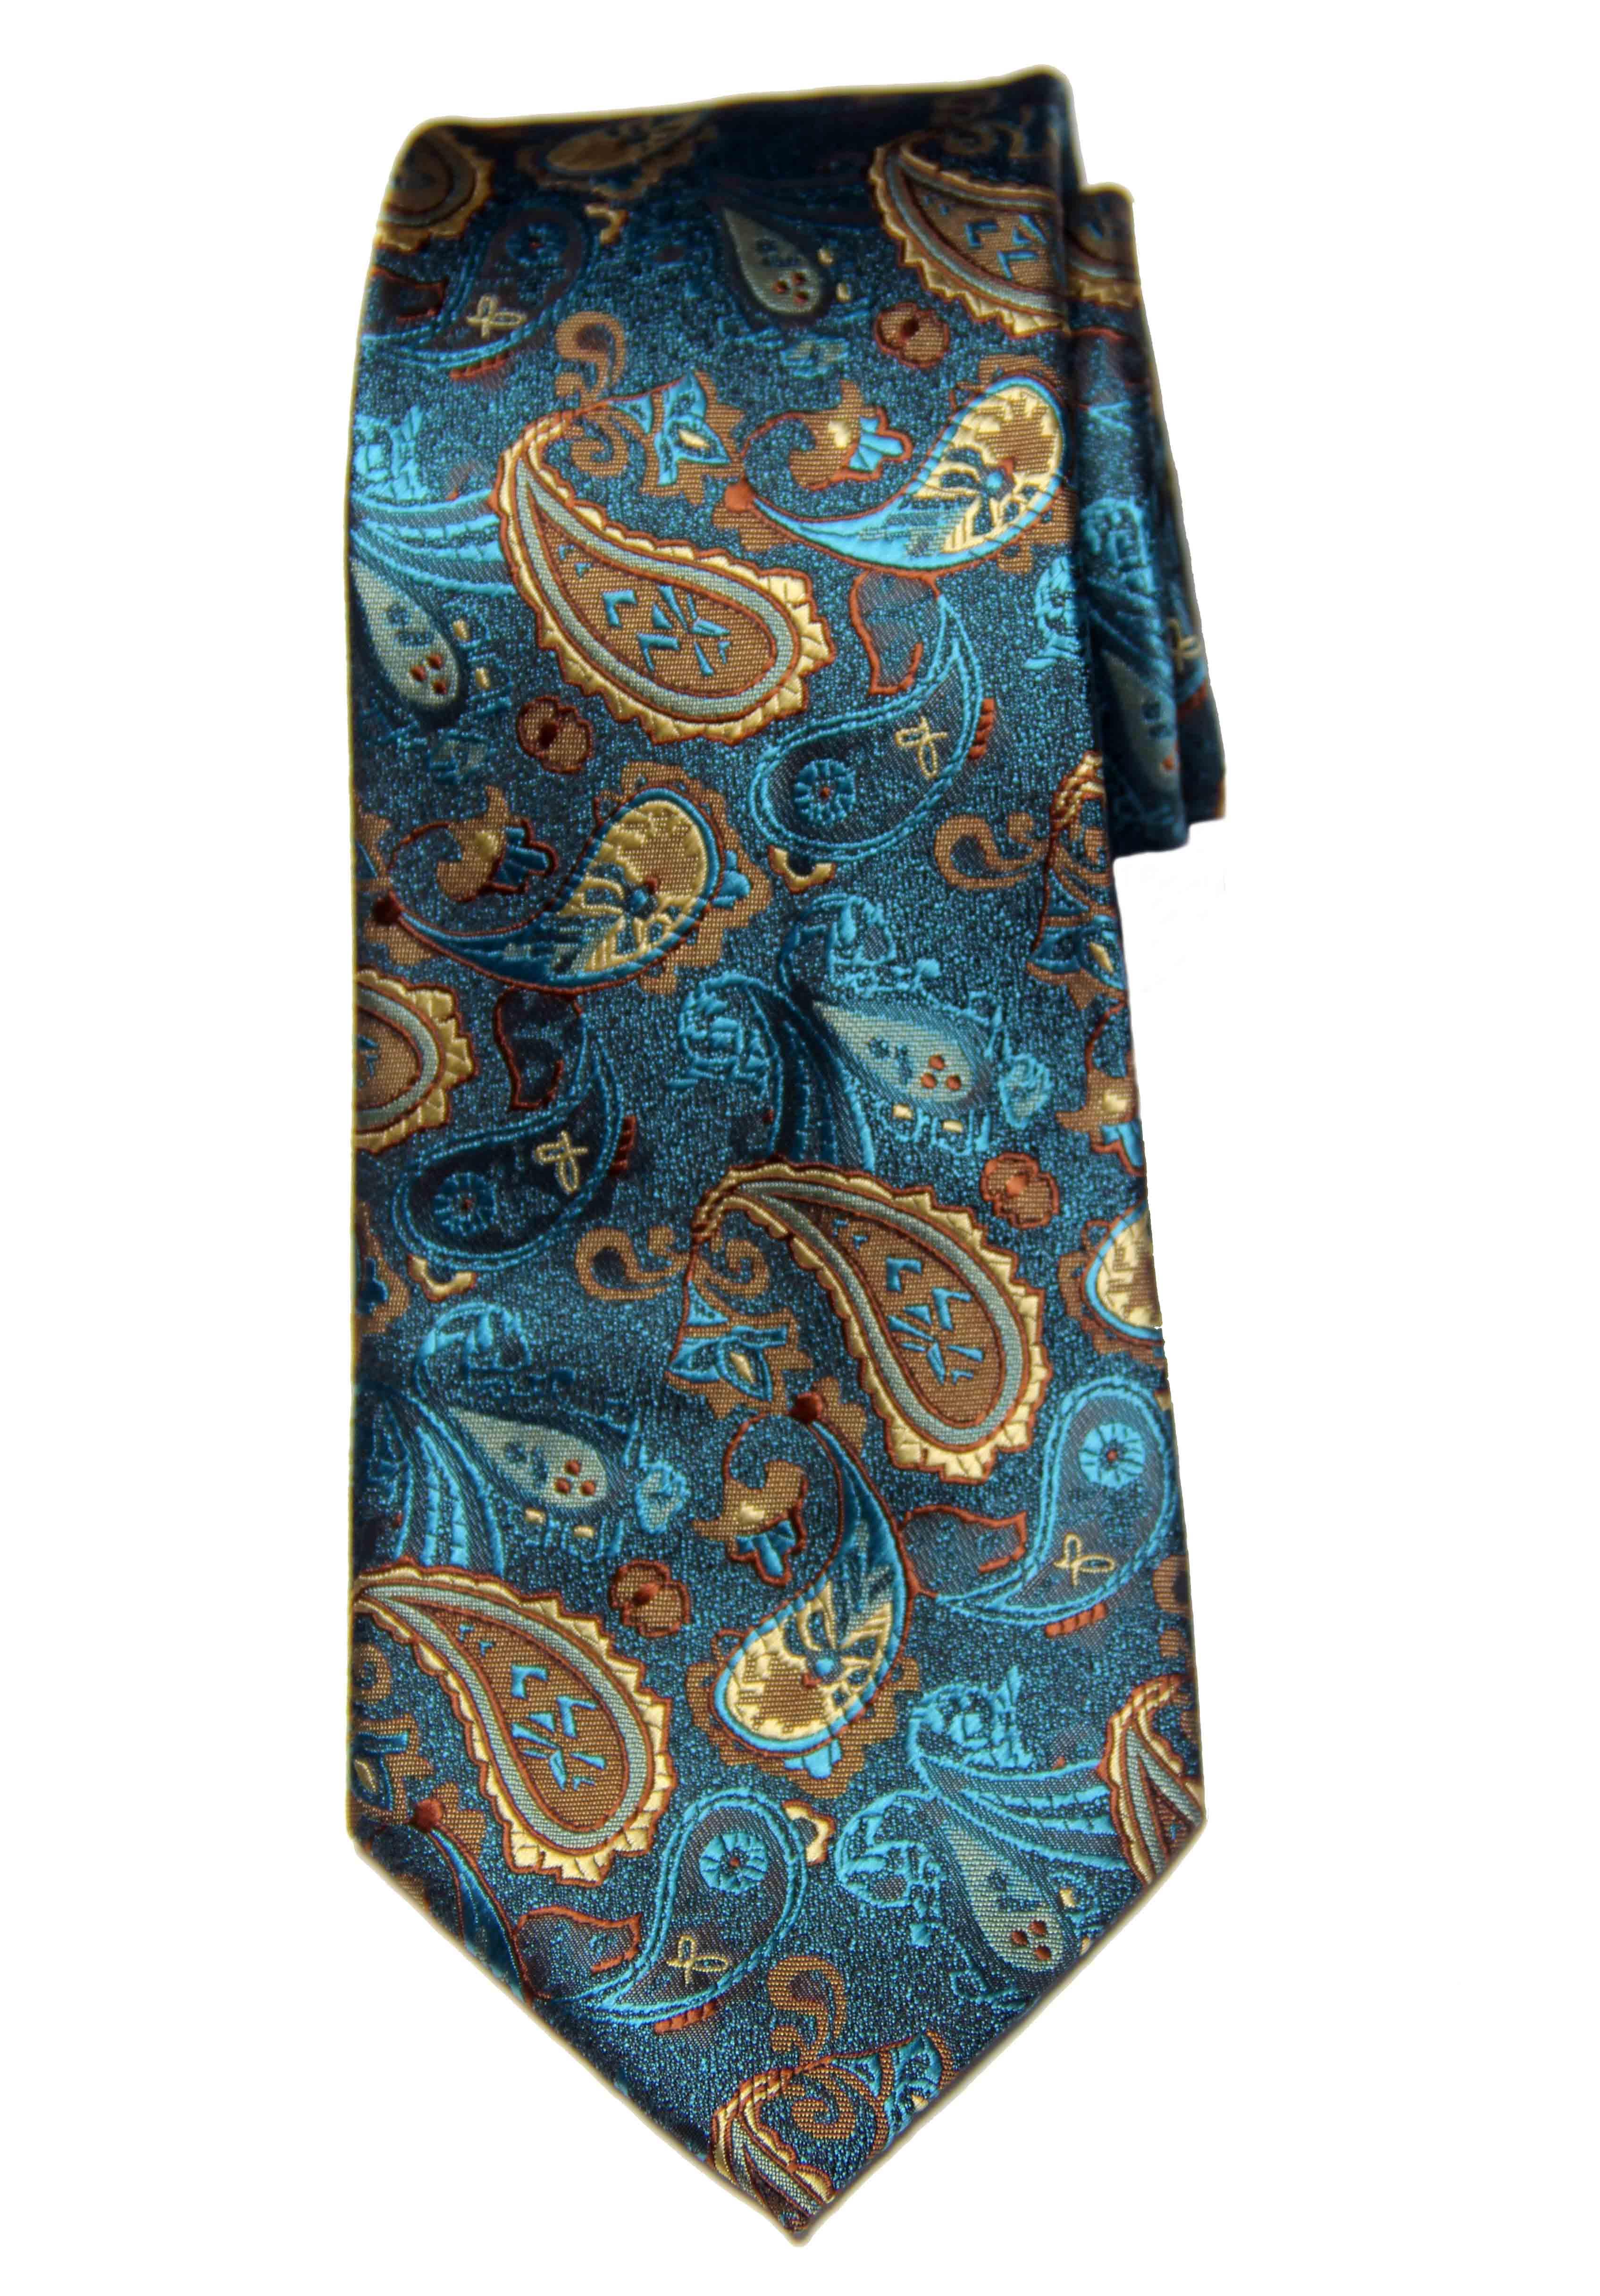 Gascoigne Silk Jacquard Tie Teal Blue Brown Gray Tan Orange Paisley Men's